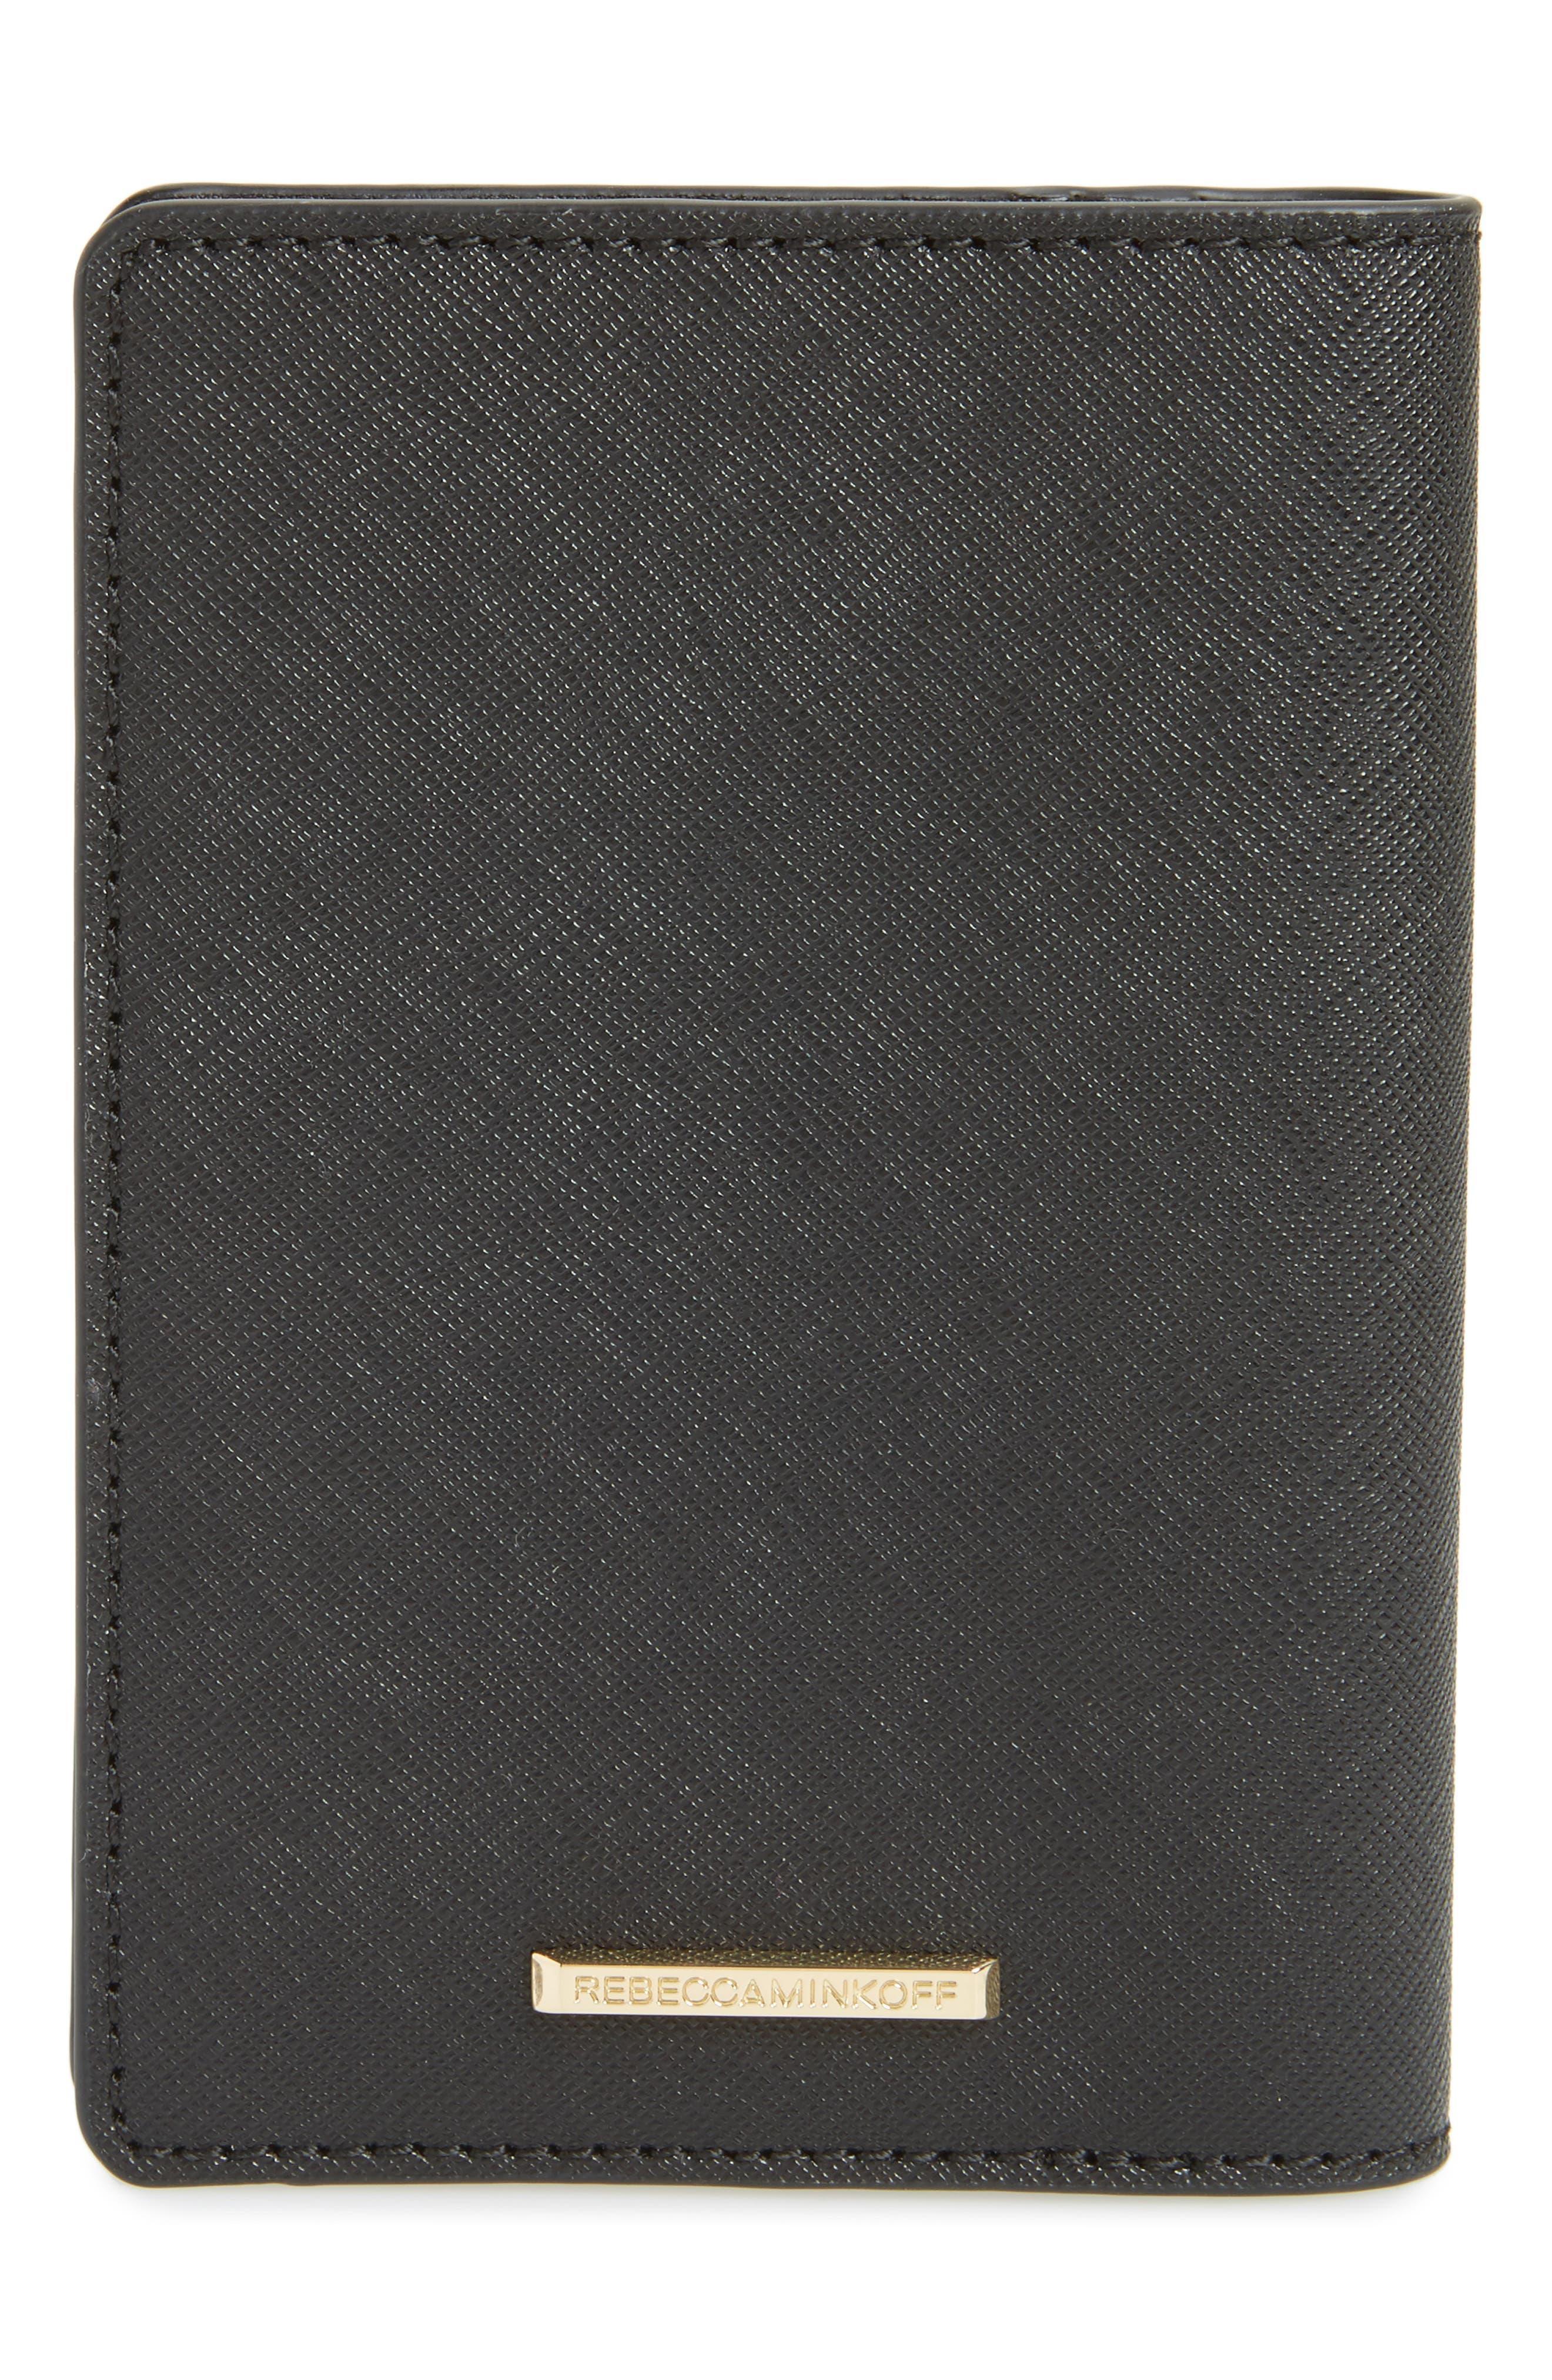 REBECCA MINKOFF, Leather Passport Holder, Alternate thumbnail 4, color, 001